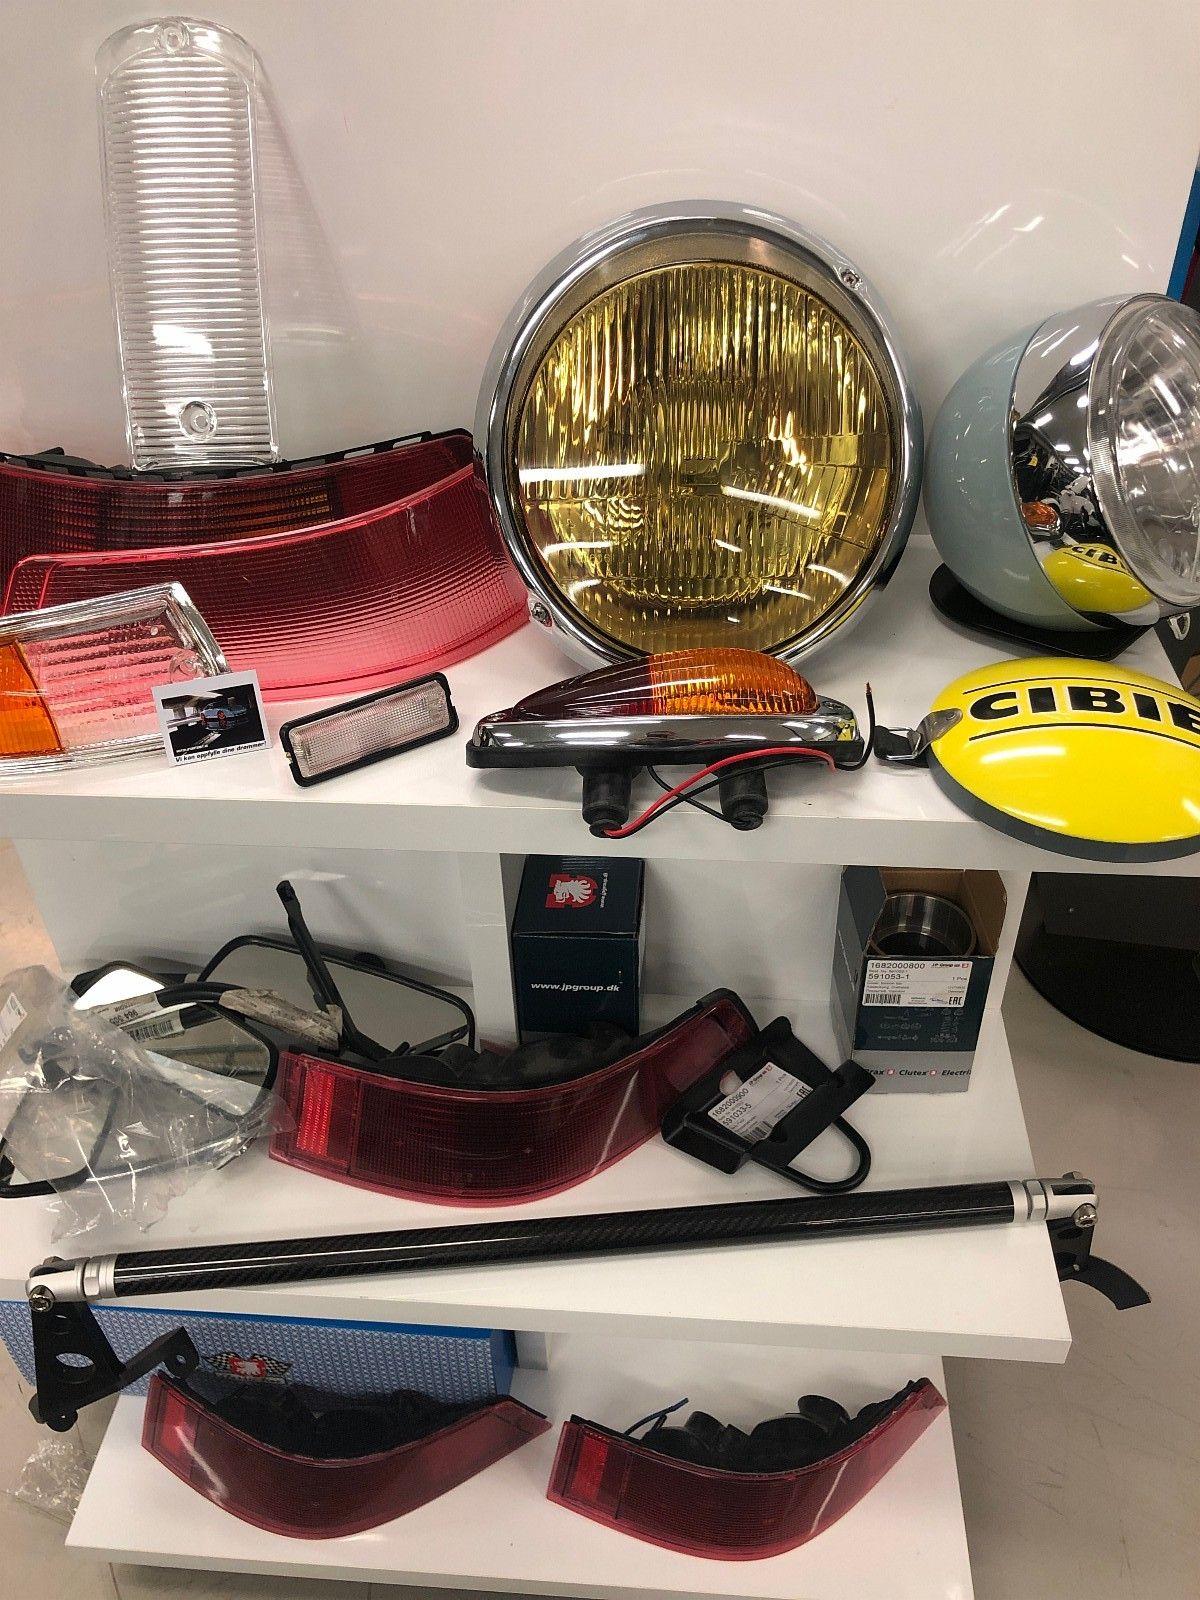 Hella Lamper, ekstralys, classic, rally, lykteglass, lys